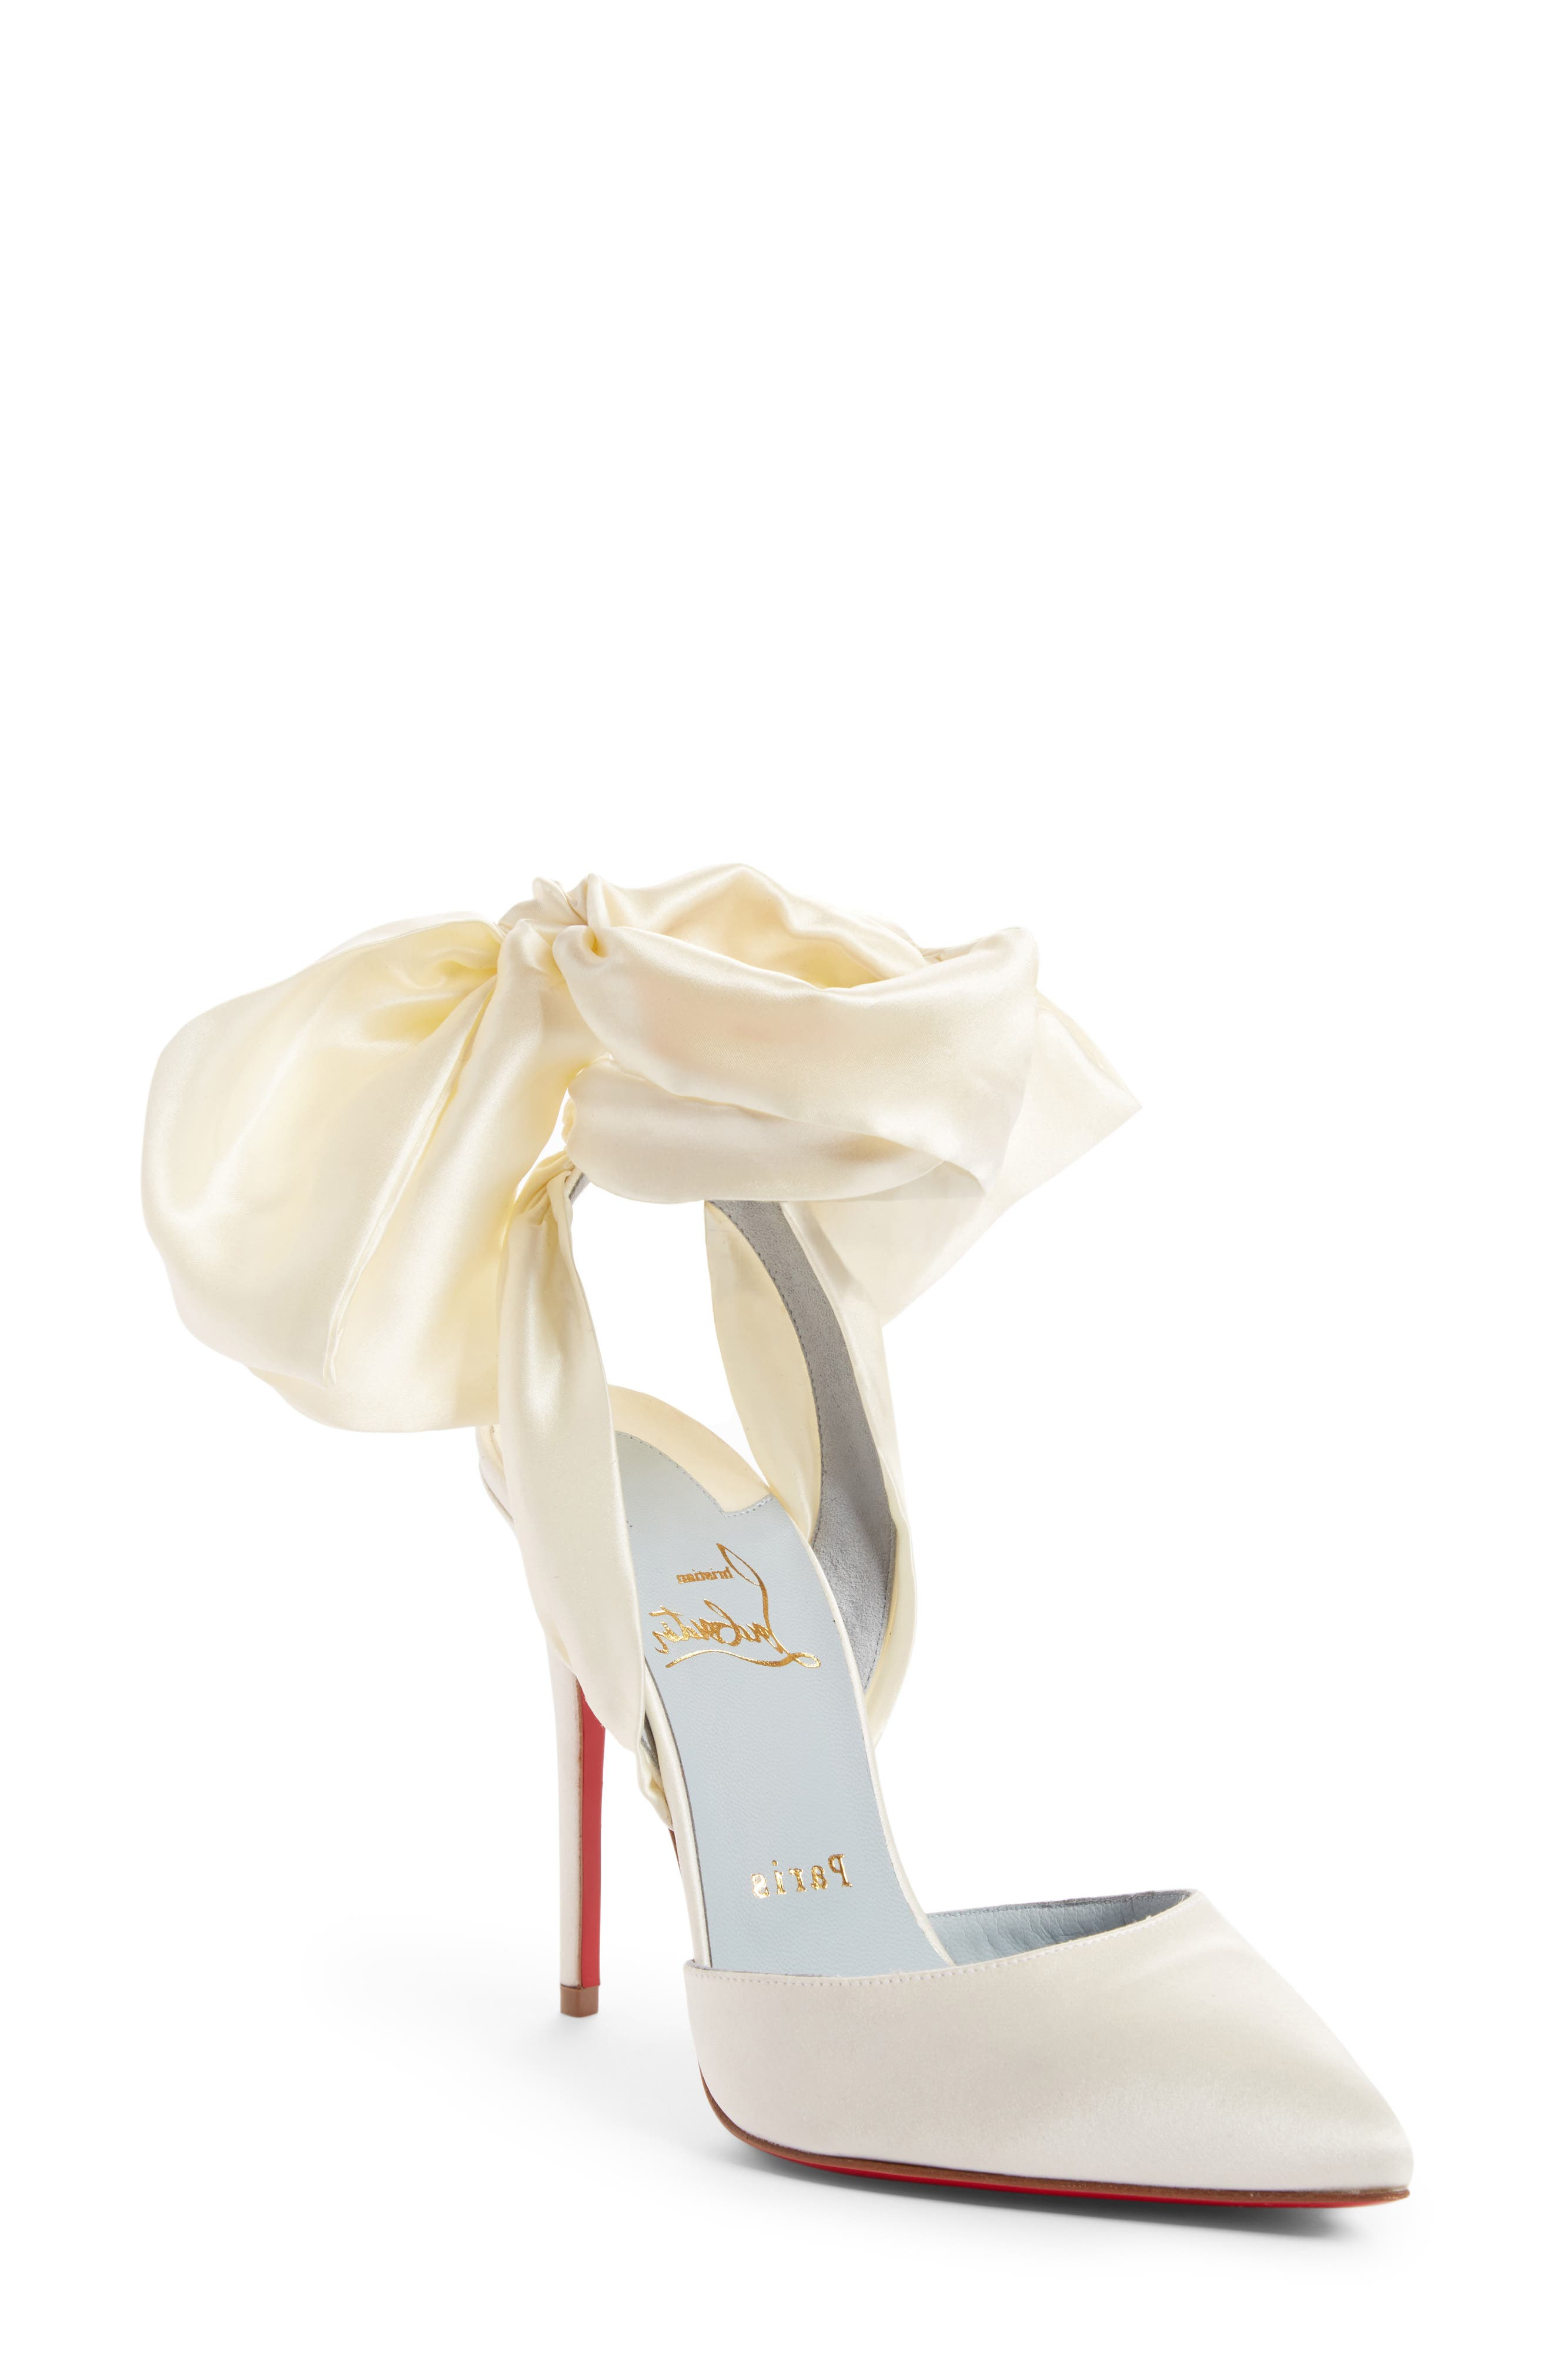 Alternate Image 1 Selected - Christian Louboutin Douce Du Desert Ankle Tie Pump (Women)